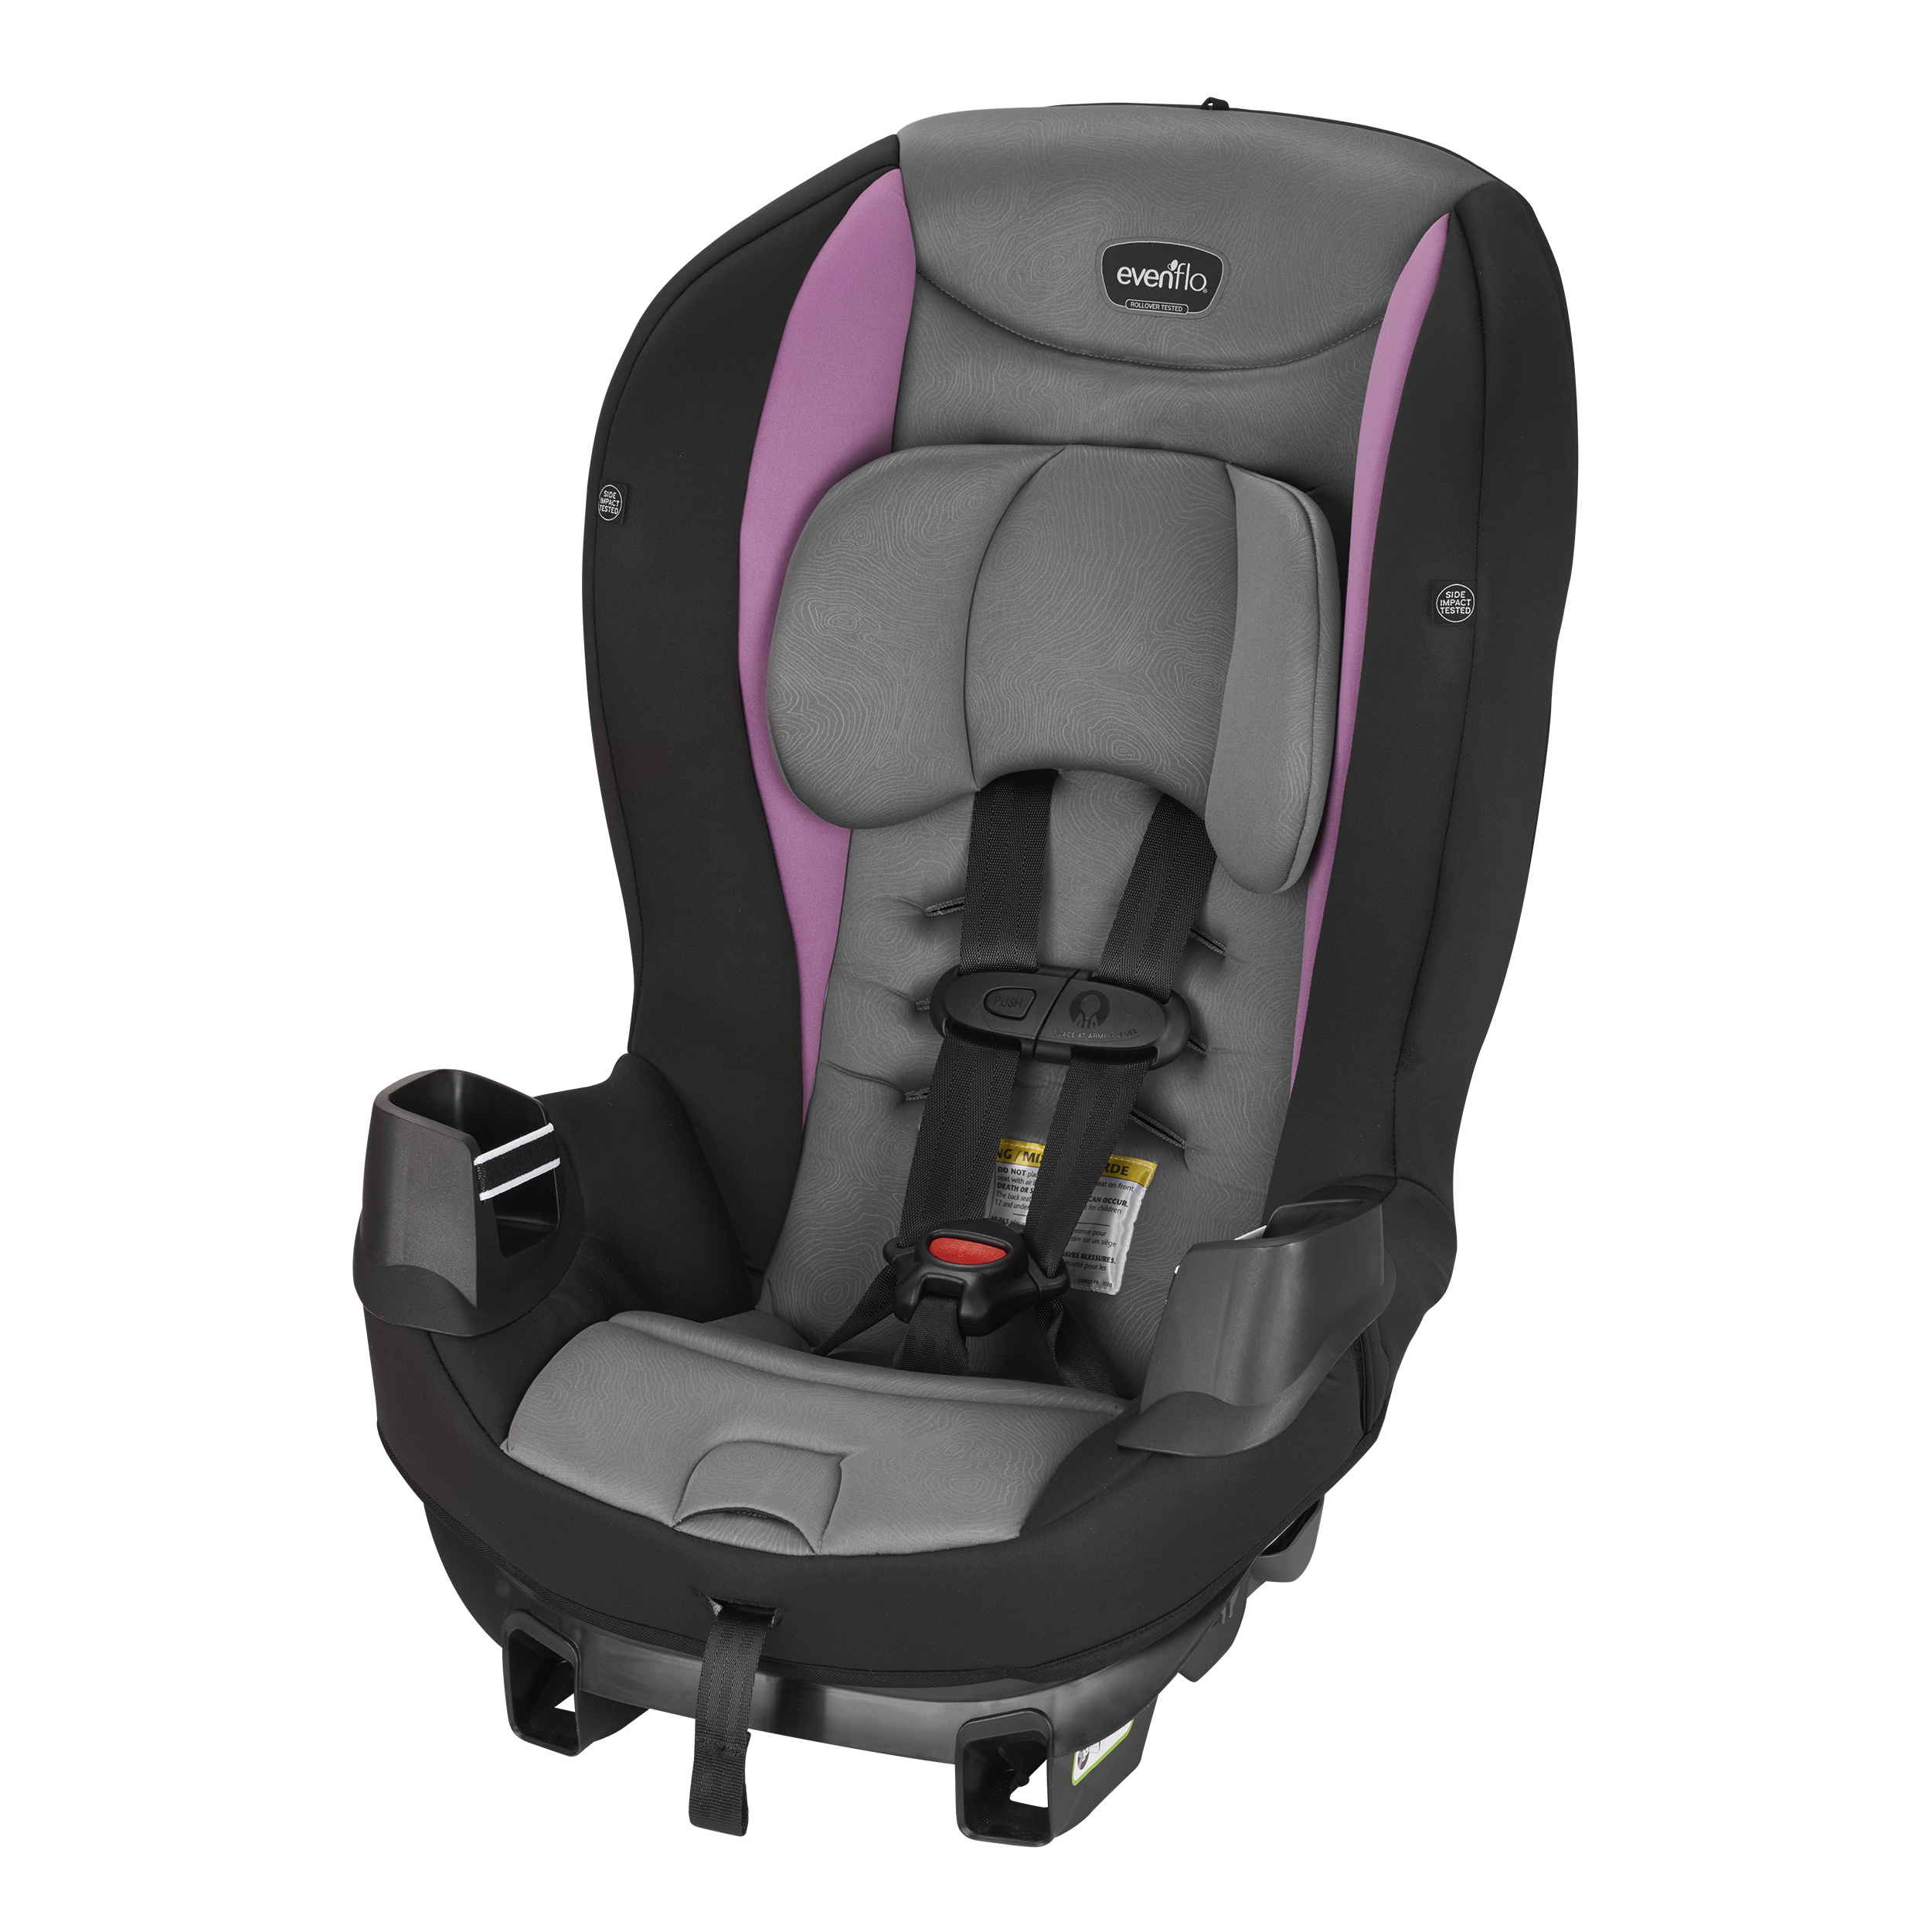 Evenflo Sonus Convertible Car Seat Amethyst